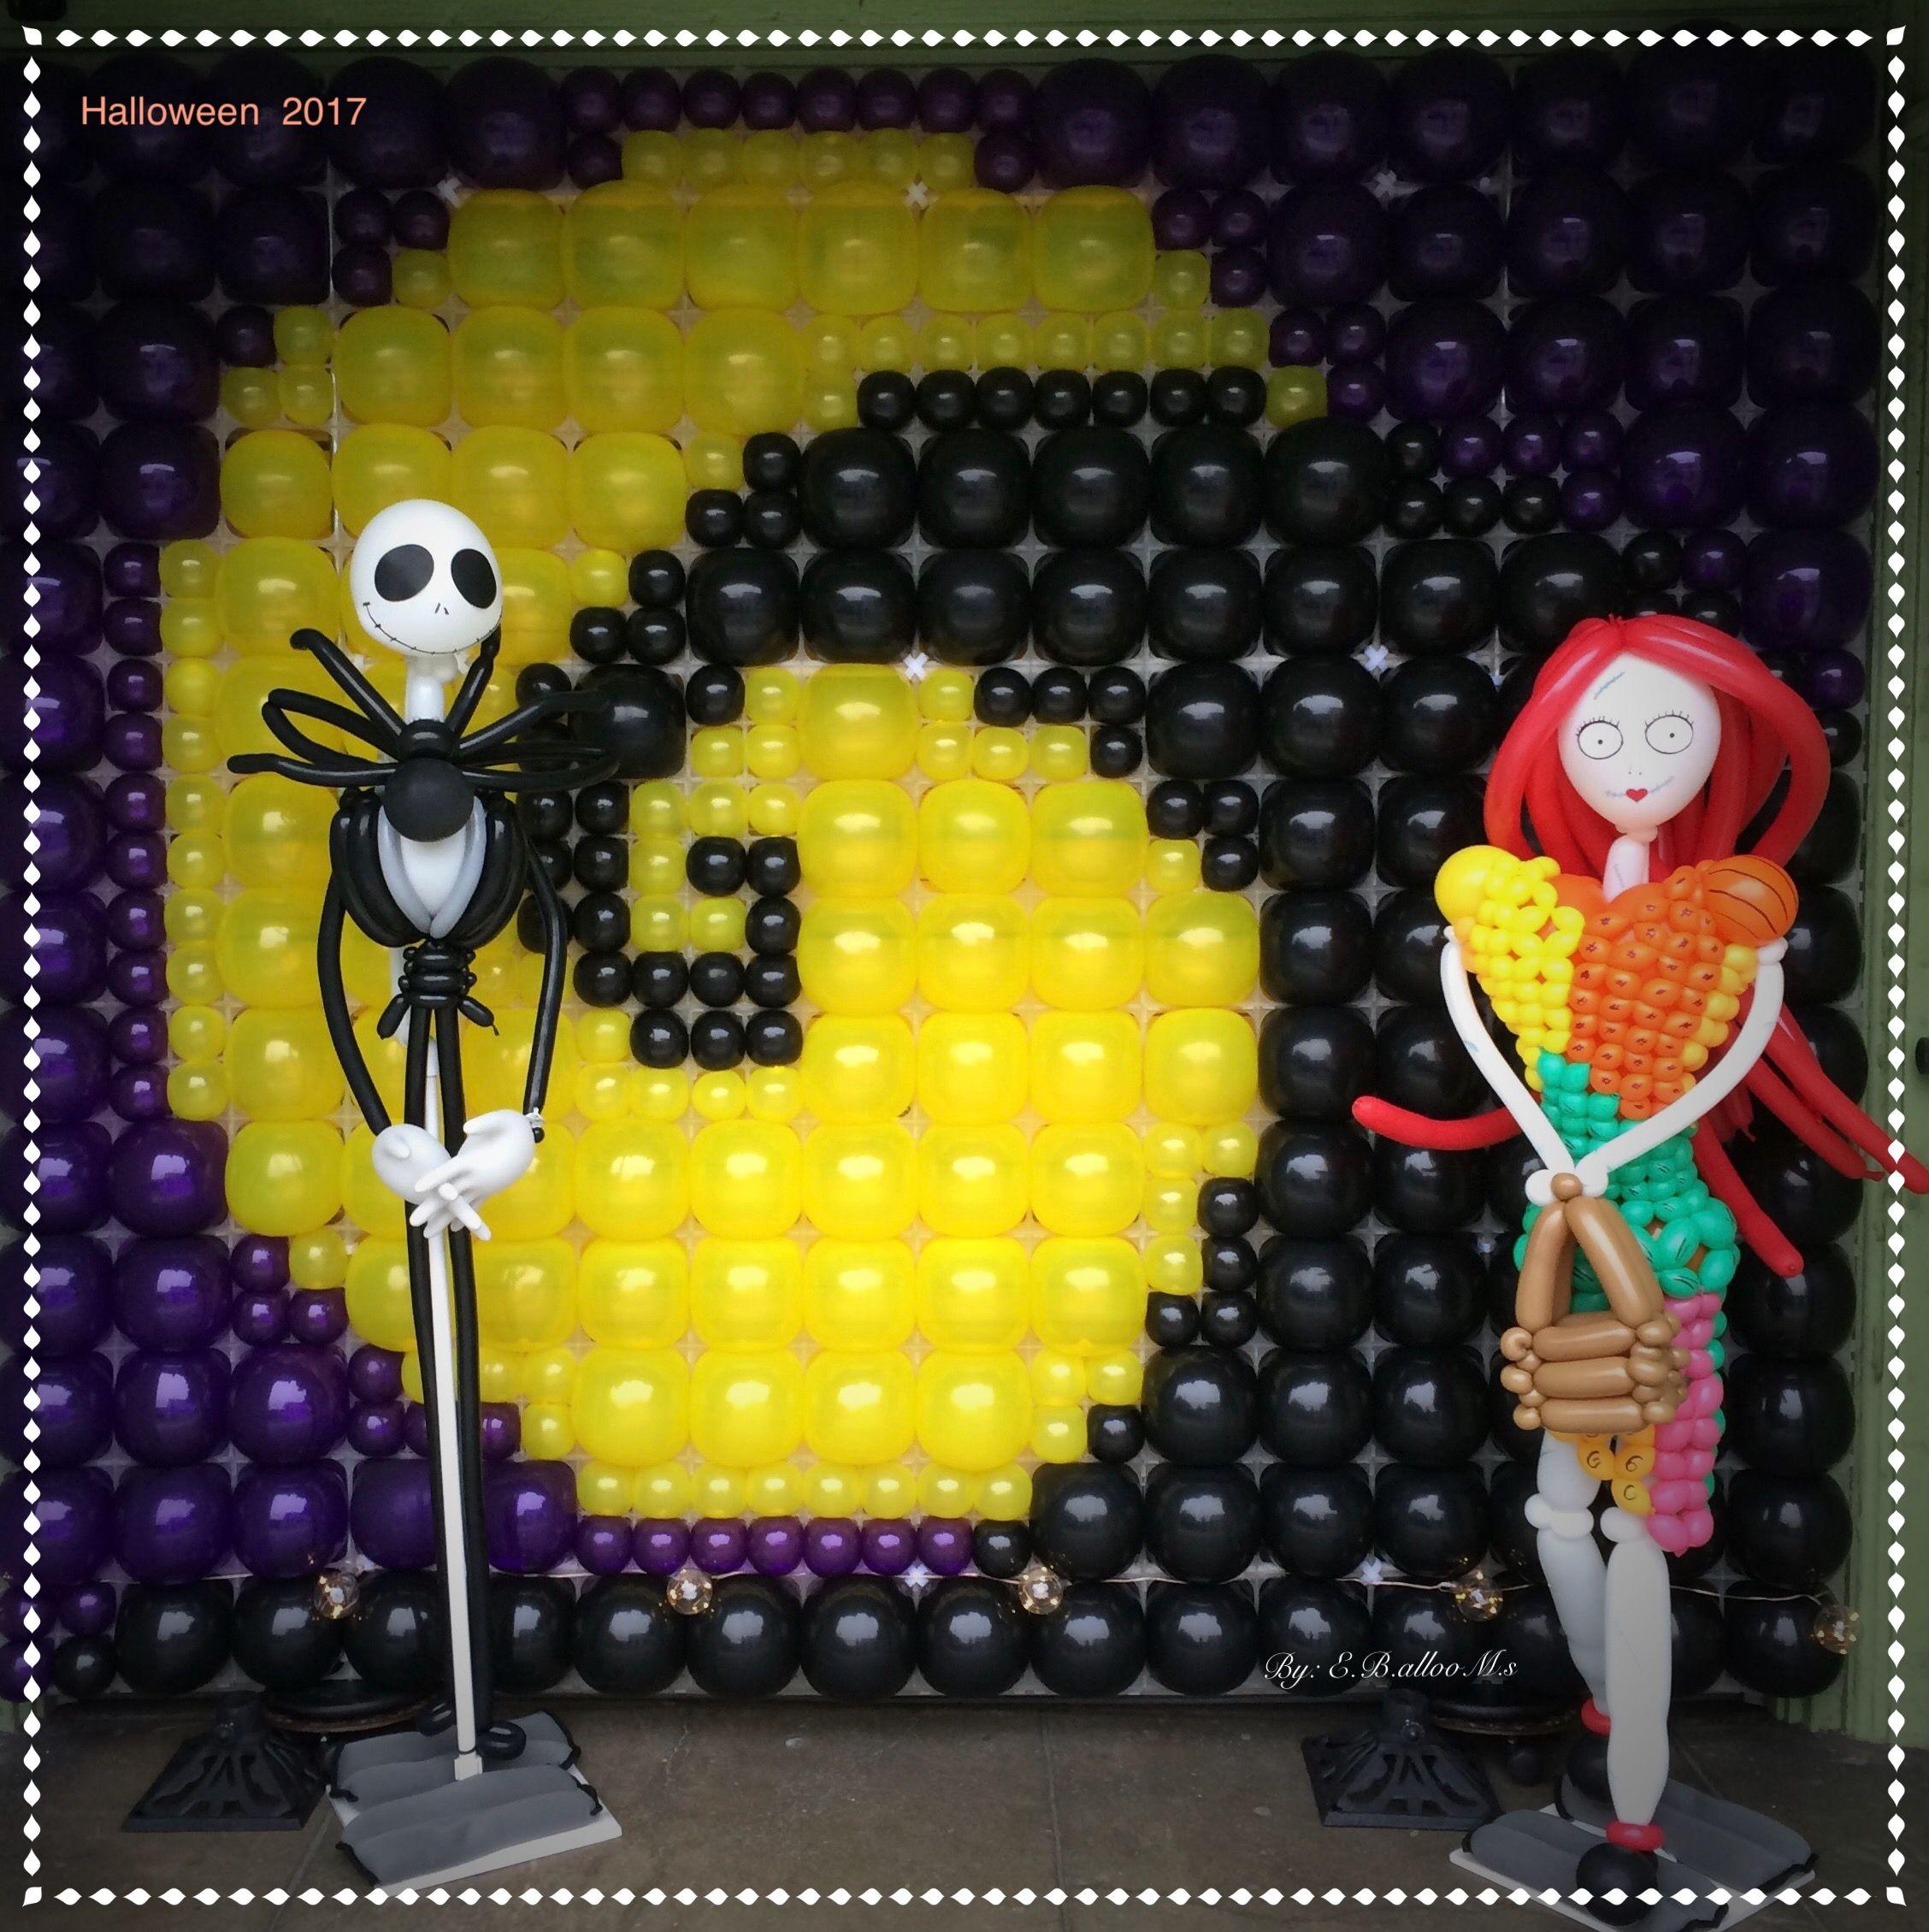 Nightmare Before Christmas Balloon Decor (Jack Skellington And Sally)